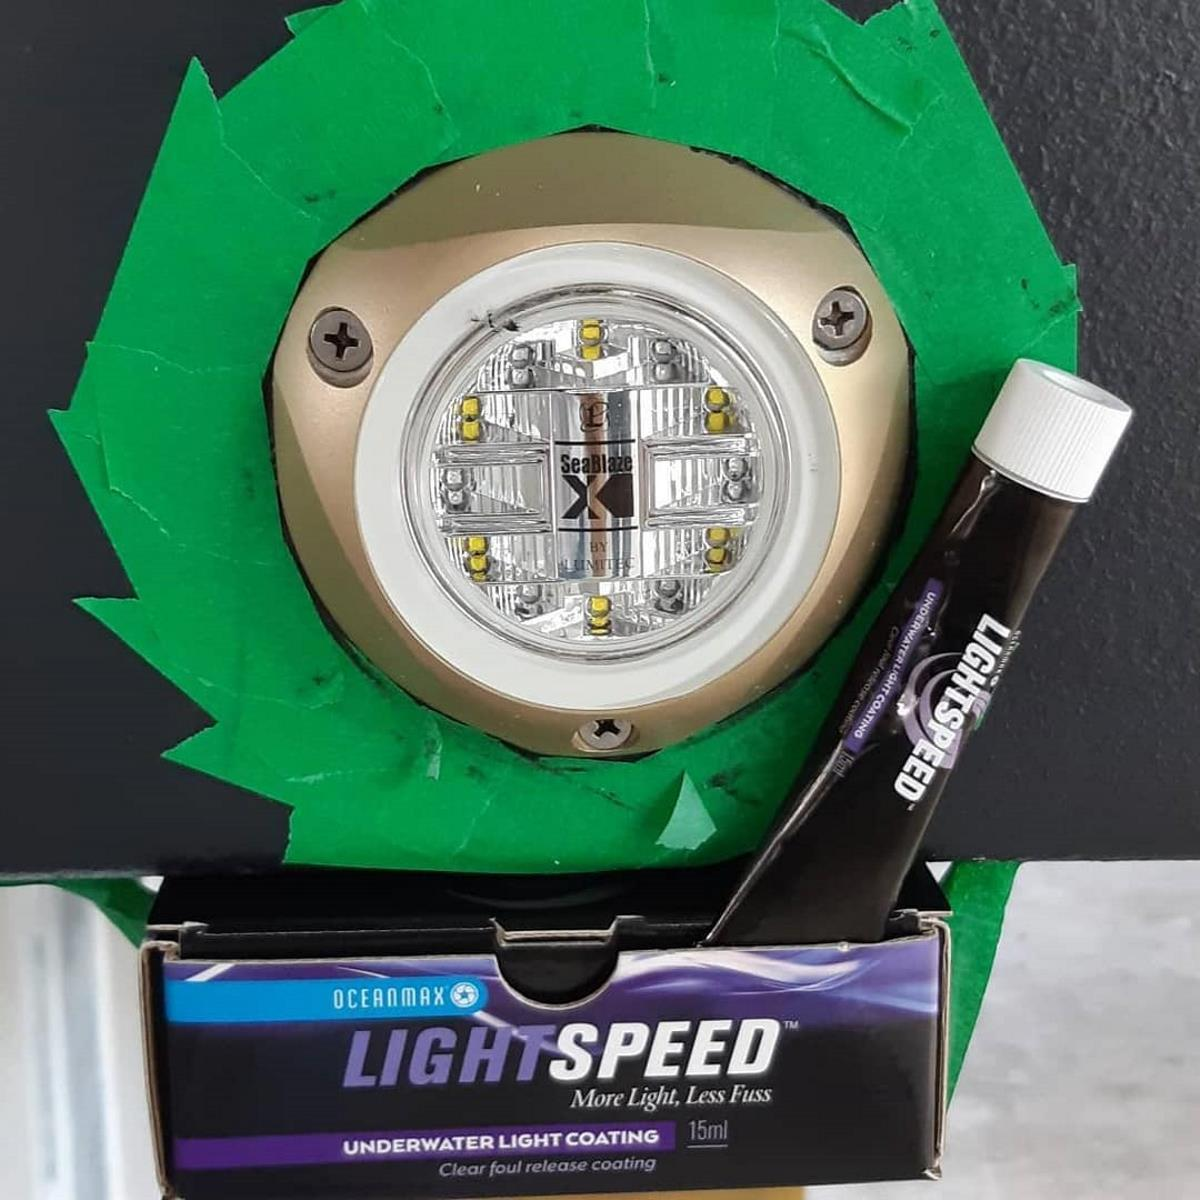 Lightspeed: Protective coating kit for underwater lighting